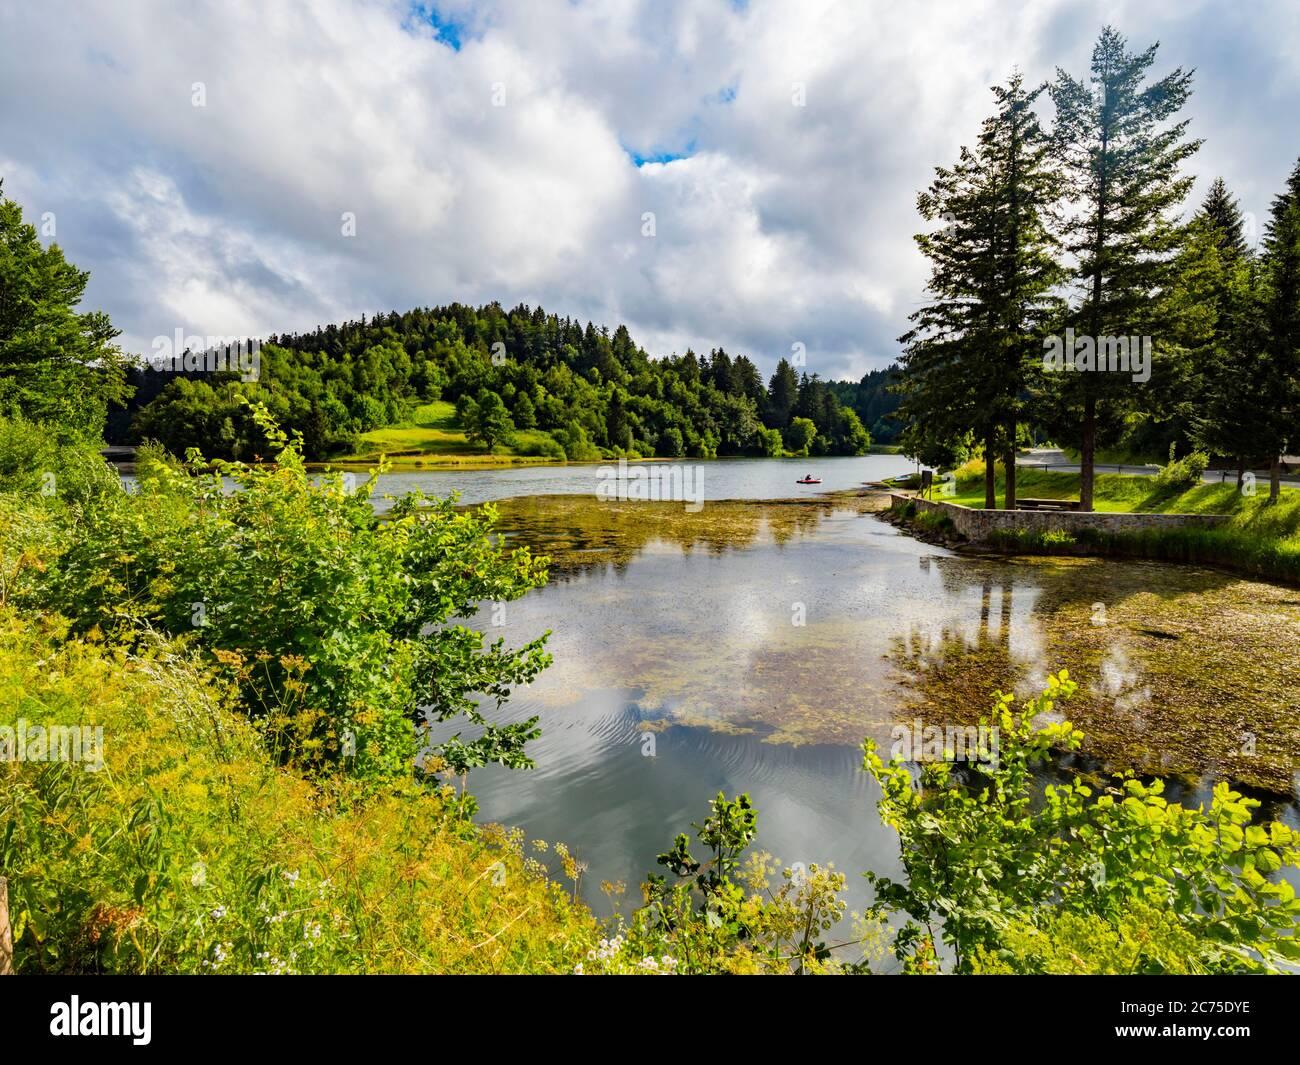 Carov most lake Mrzla vodica in Croatia Europe Stock Photo